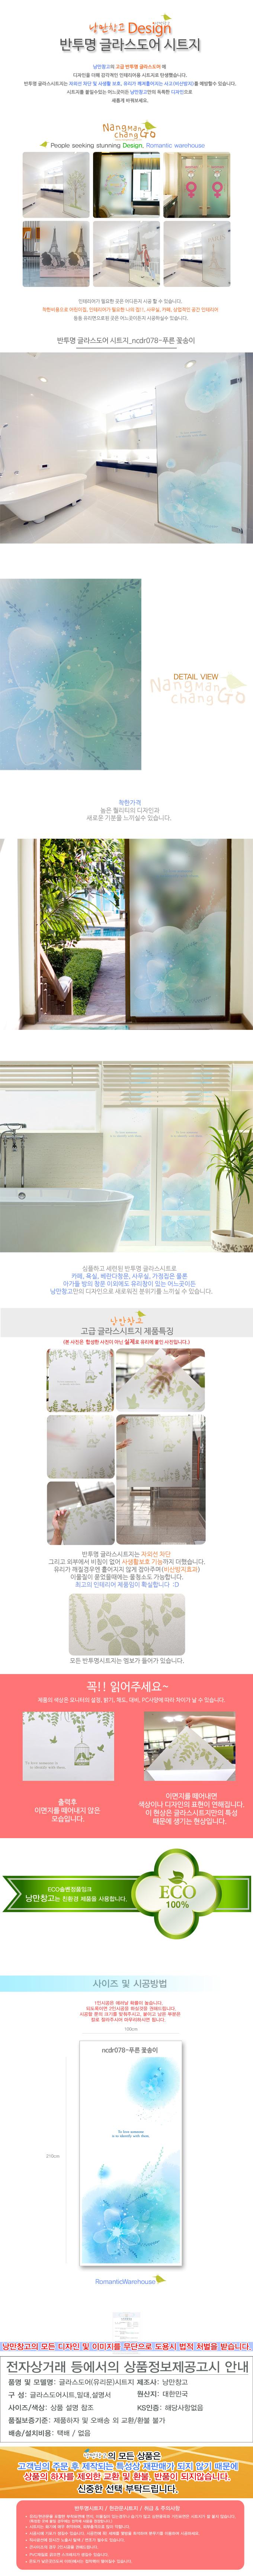 ncdr078-푸른 꽃송이-샤워부스 유리문시트지 - 낭만창고, 28,800원, 벽시/시트지, 디자인 시트지